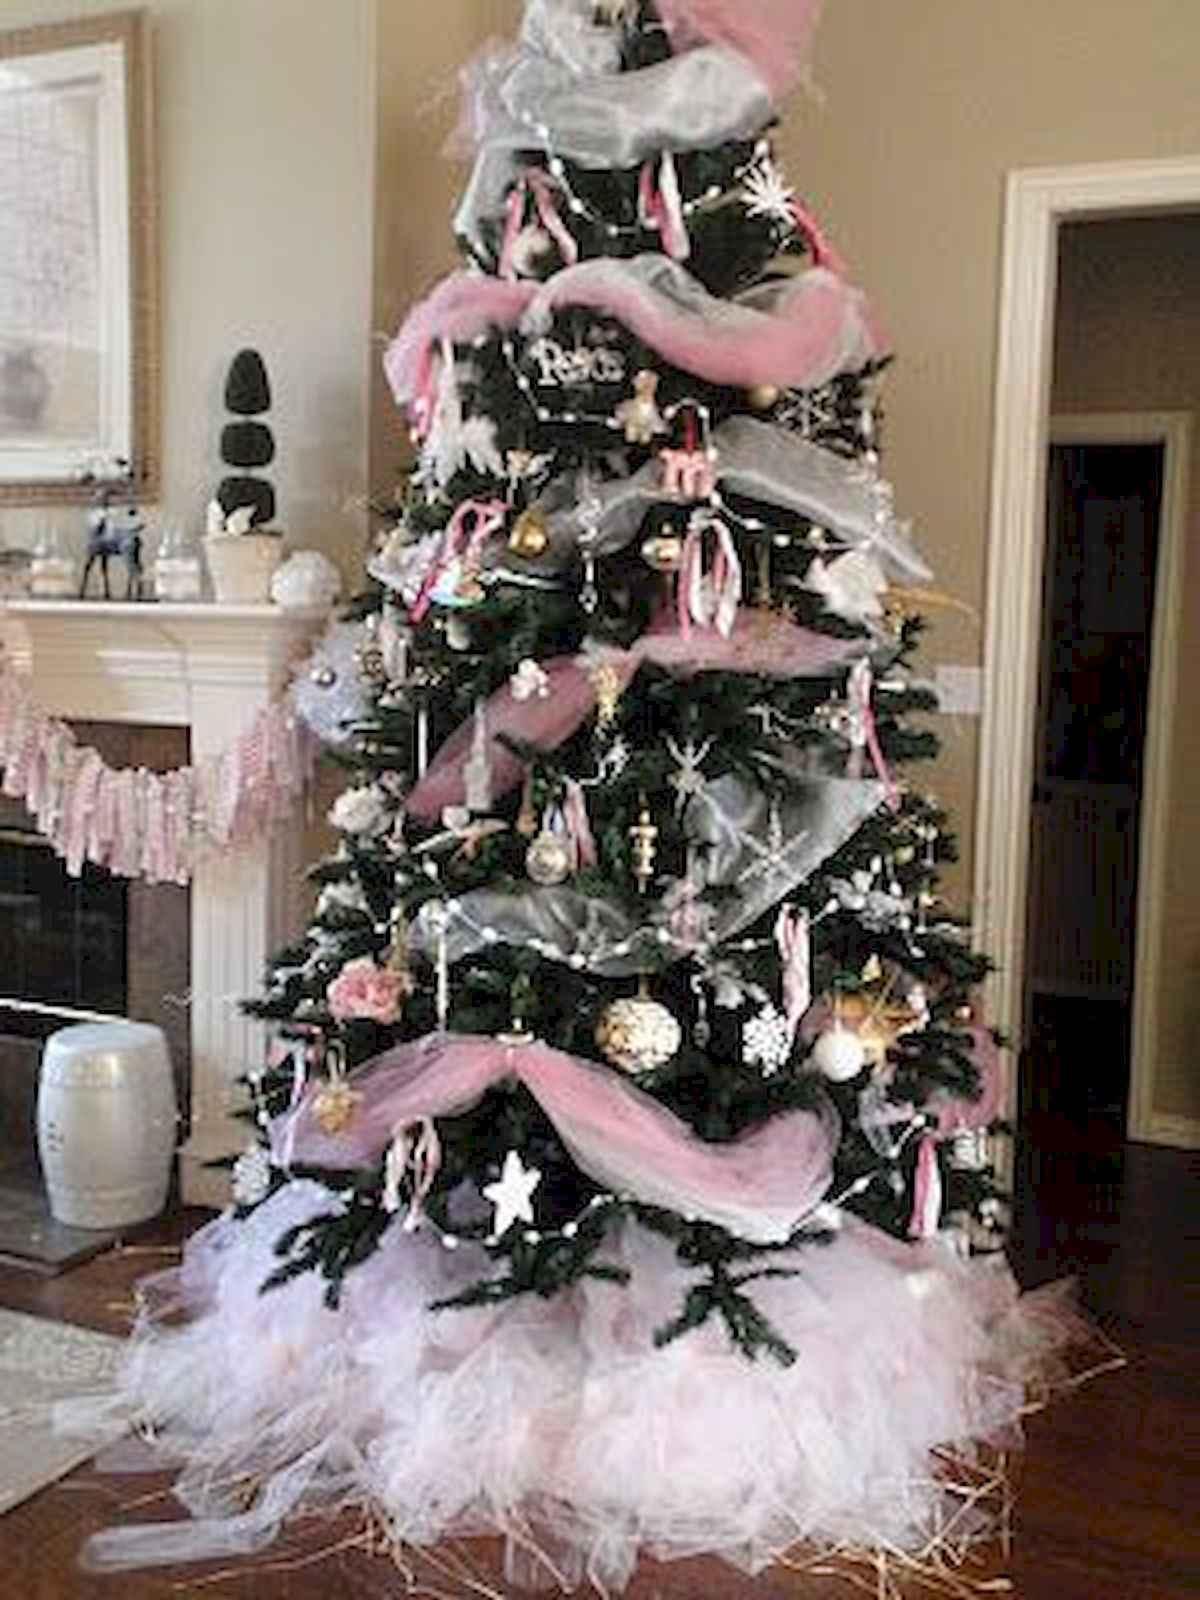 40 elegant christmas tree decorations ideas (20)